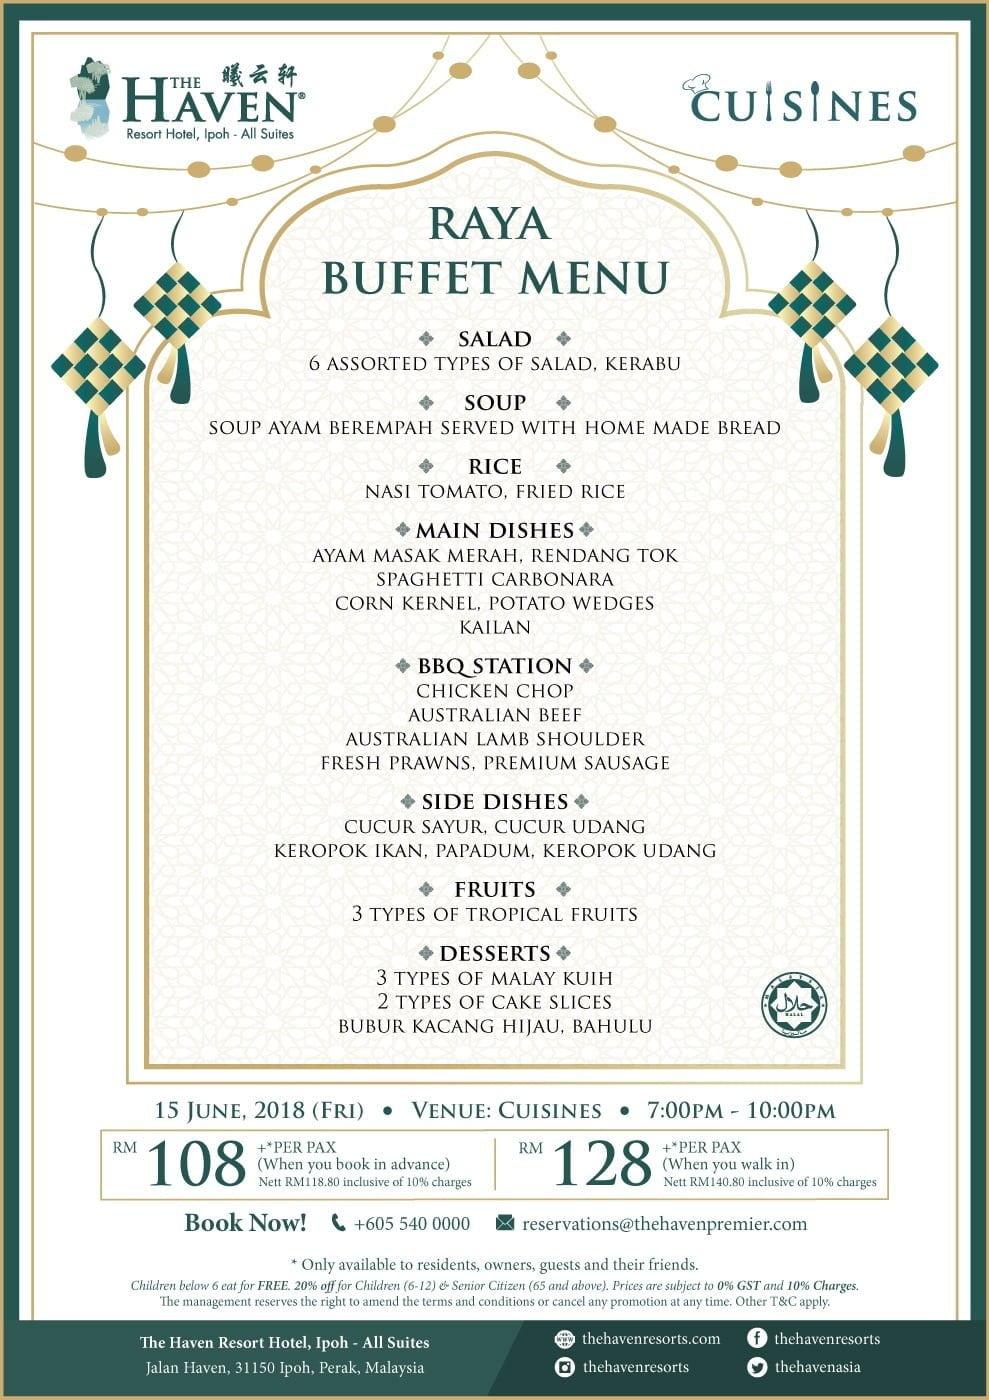 menu for Friday, 15th June, 2018